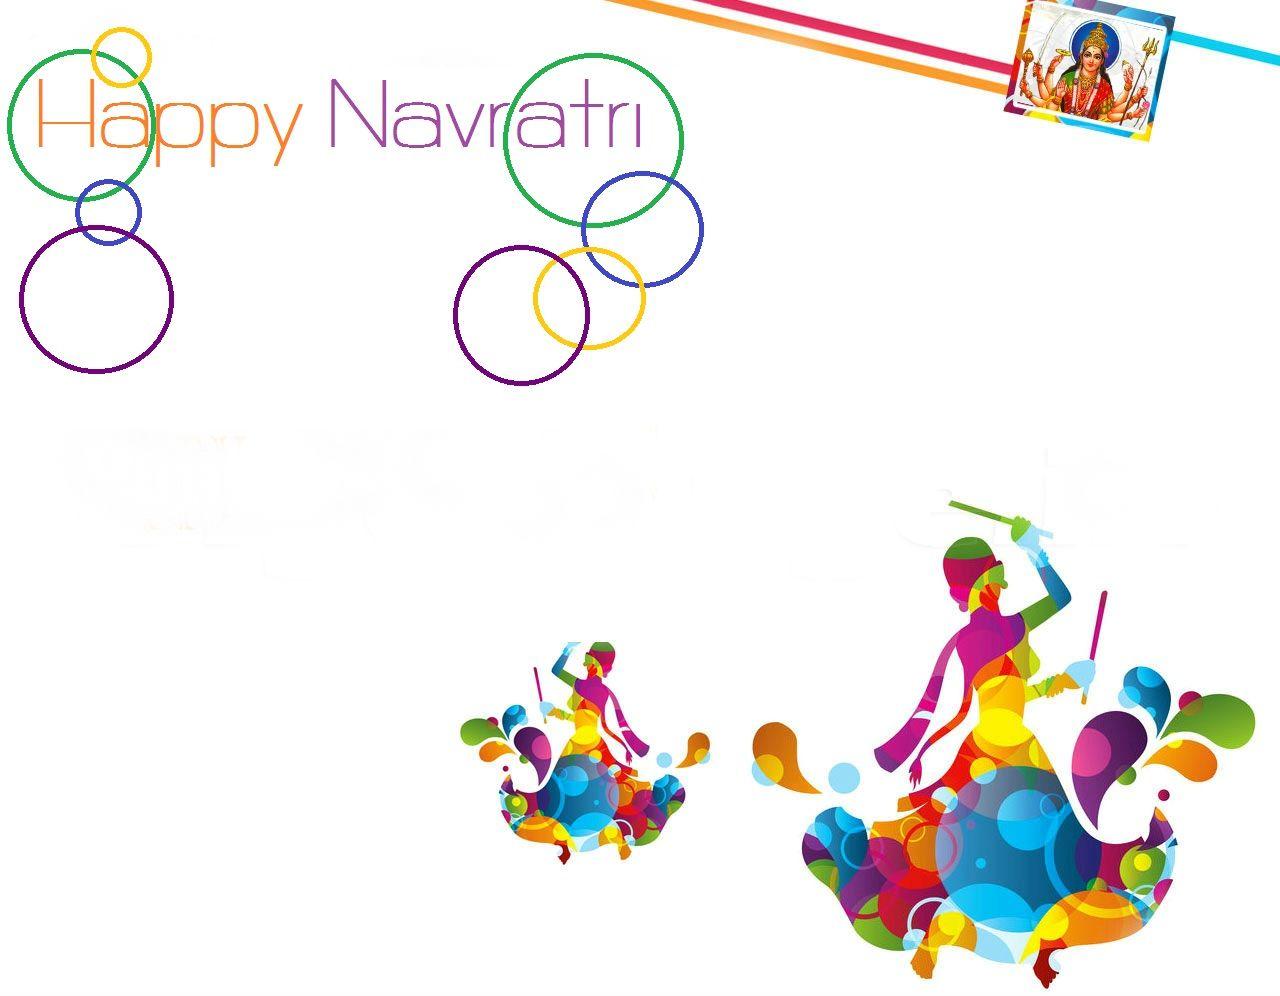 Happy Navratri Wishes Navratri Pinterest Happy Navratri